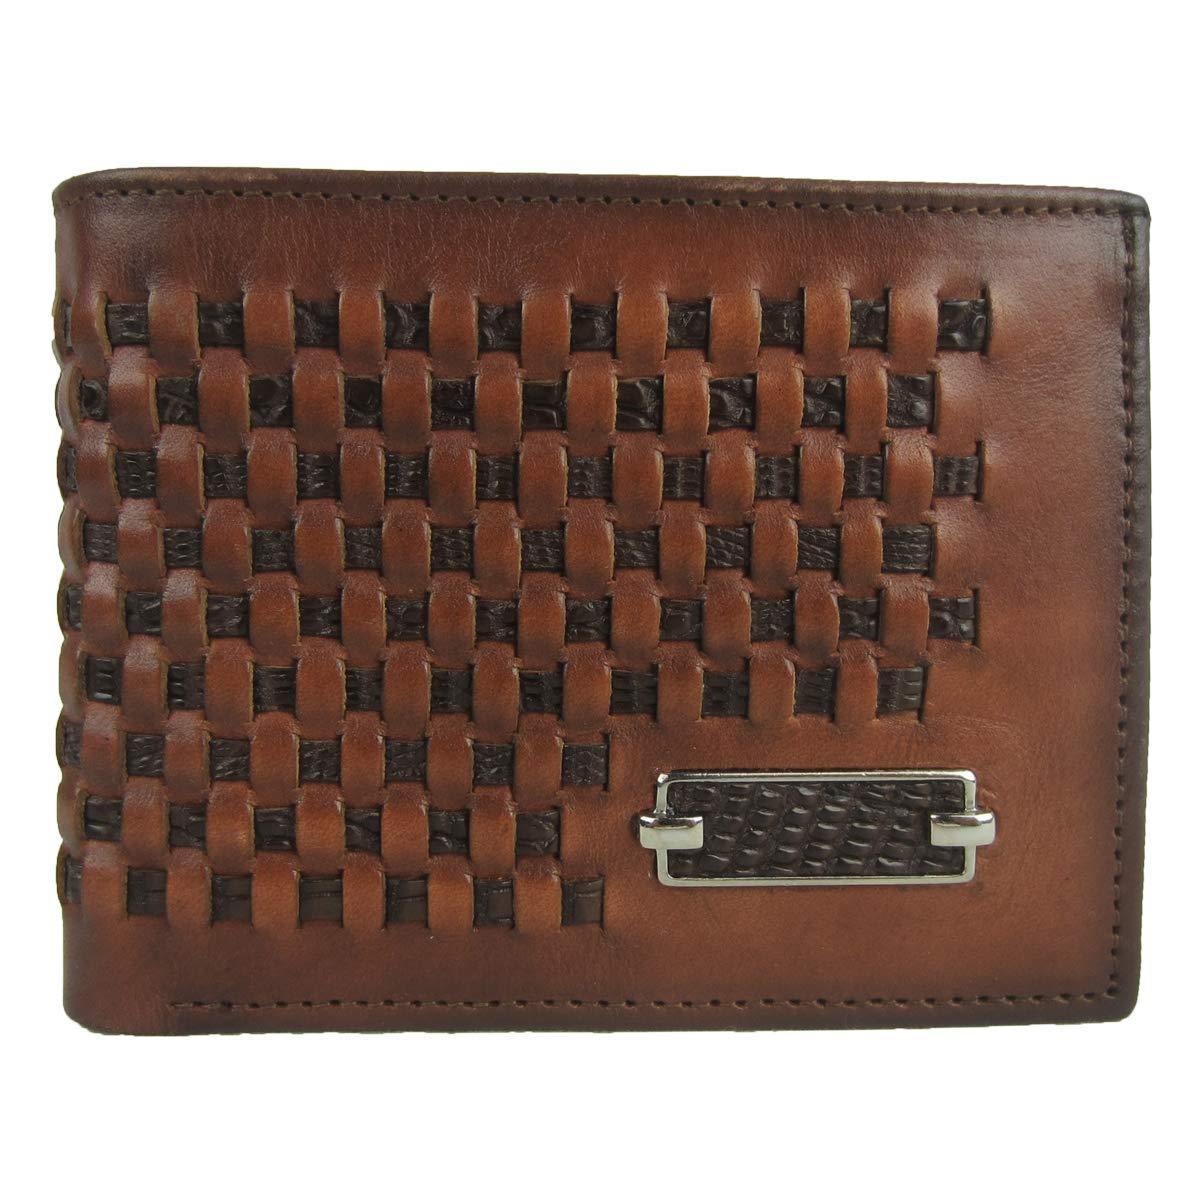 DU168 Cuadra Brown Teju Lizard and Bovine Leather Exotic Bifold Wallet